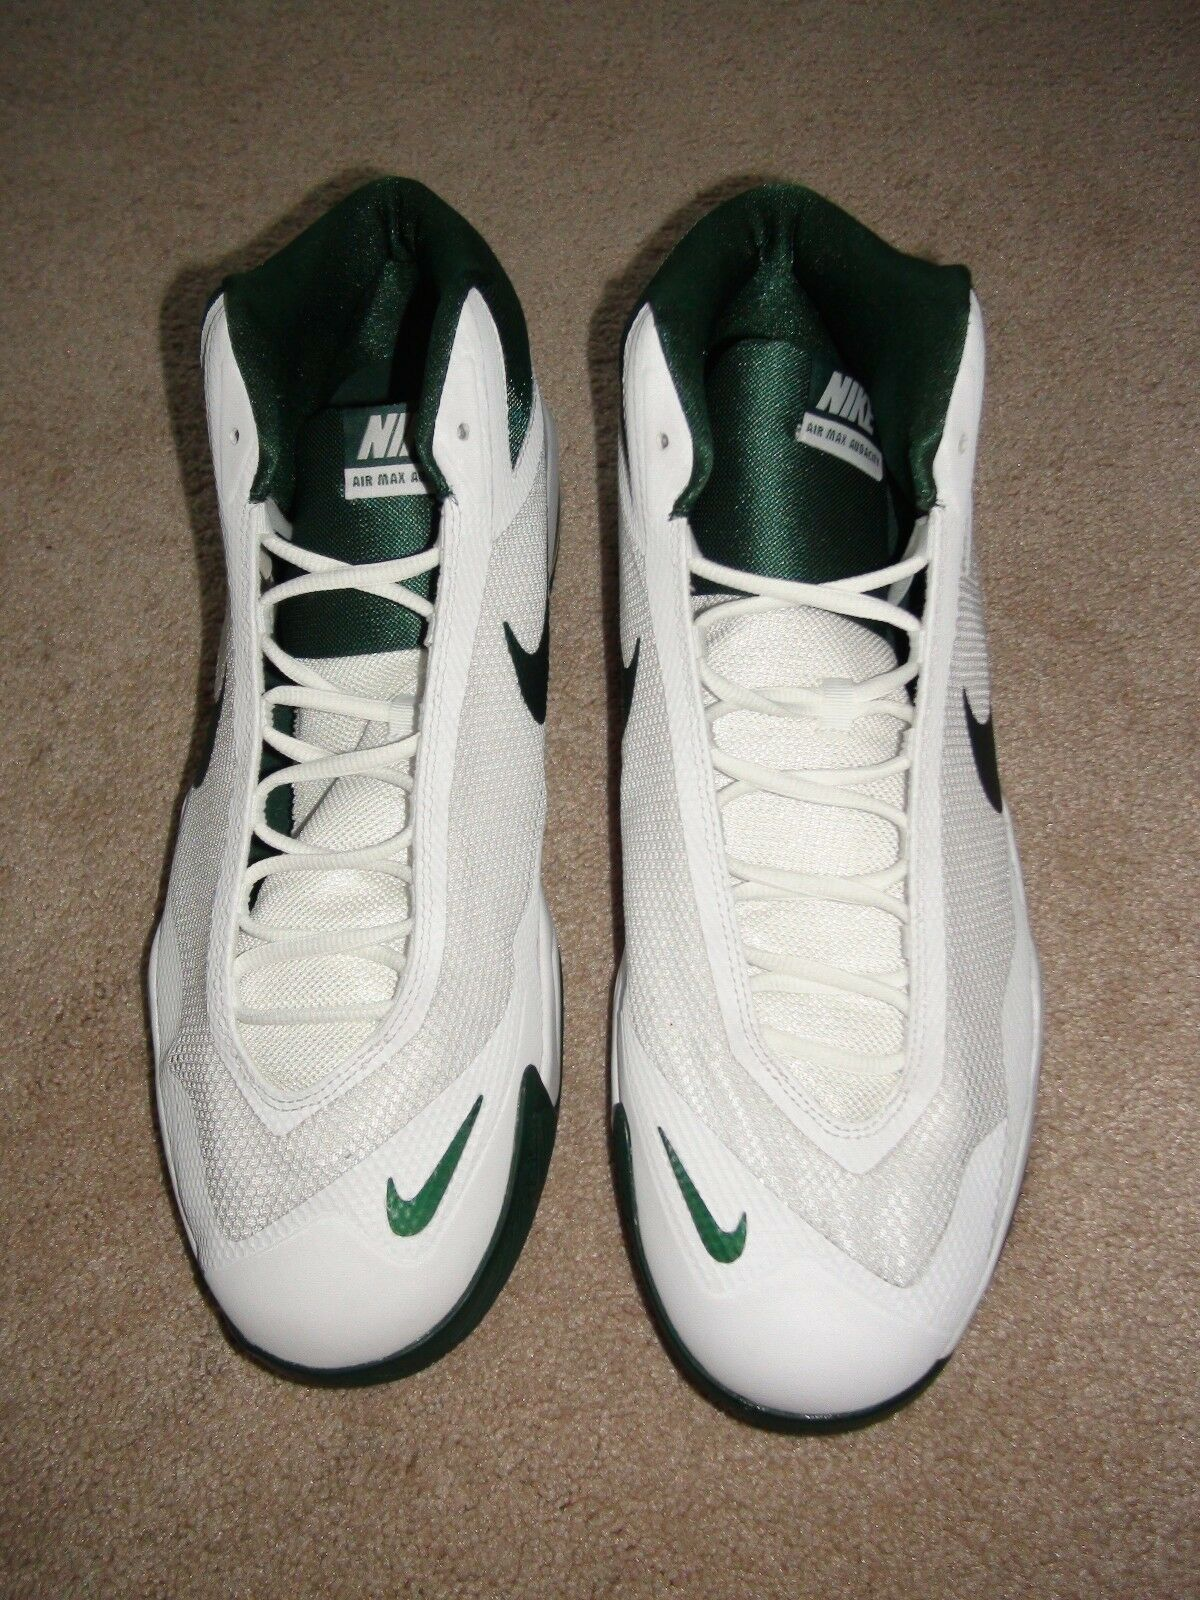 Men's Nike Air Max Audacity Basketball shoes White Green 813318-130 Sz 15.5 NEW